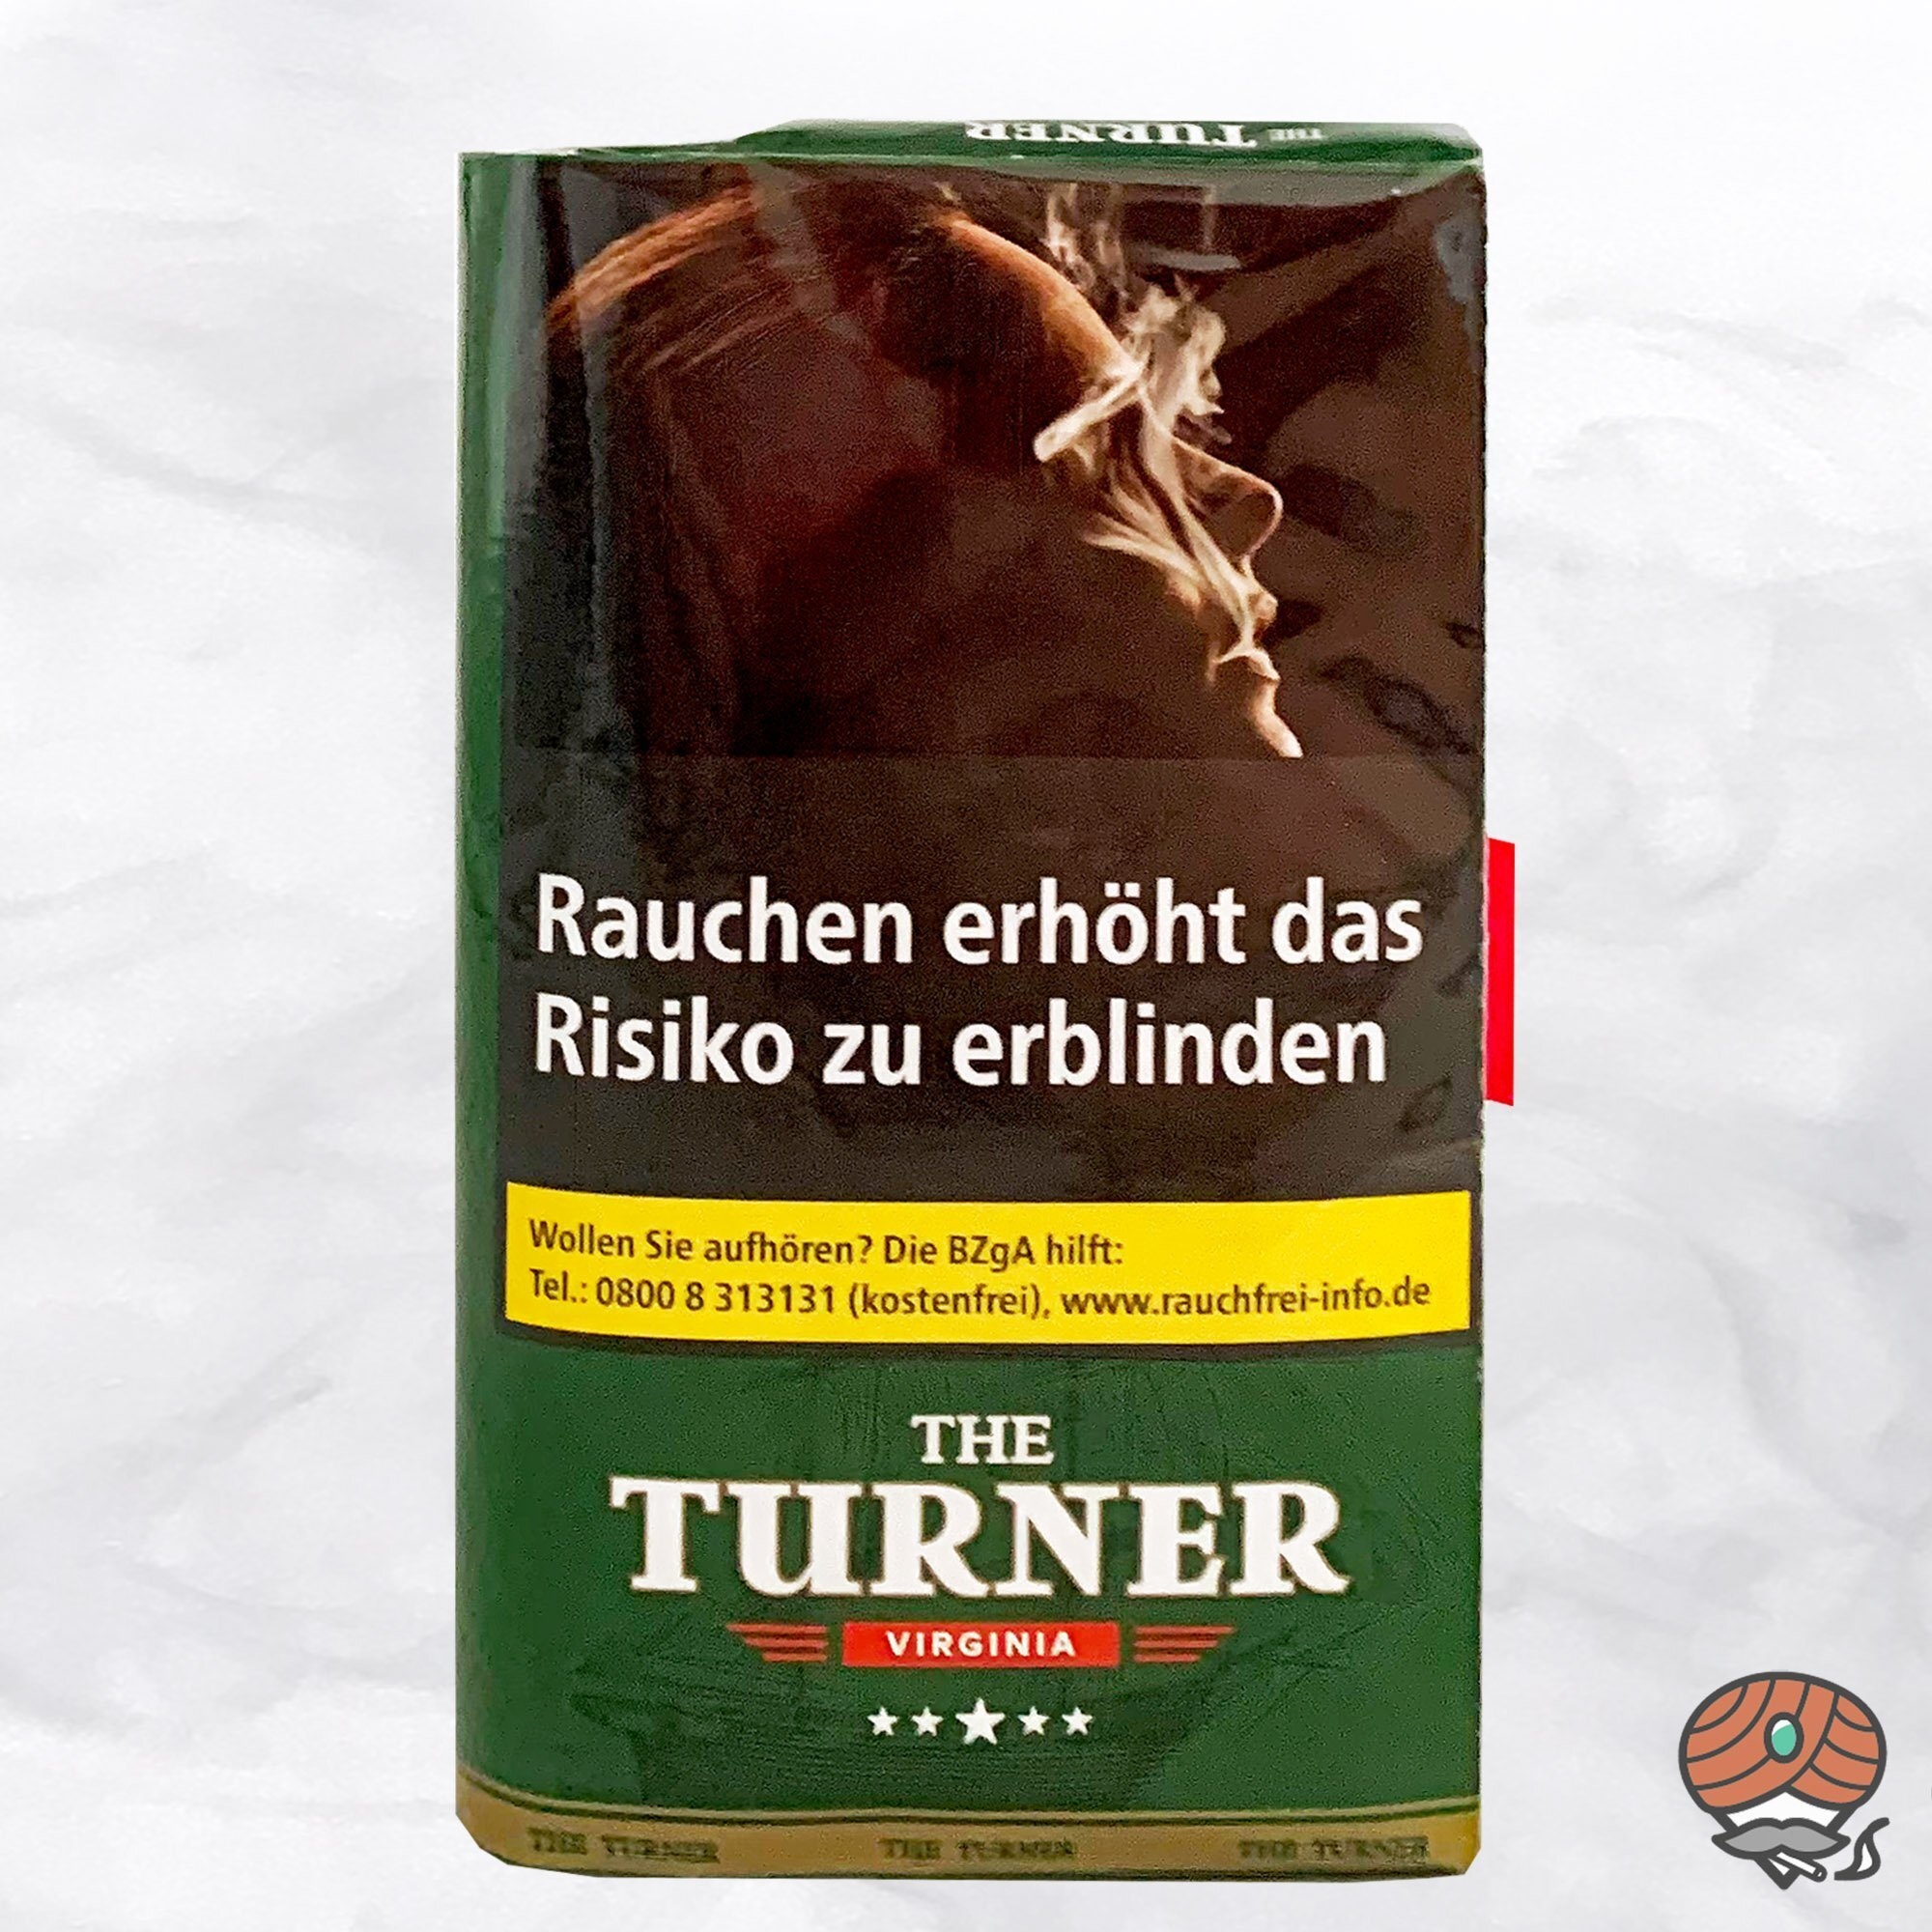 The Turner Virginia Drehtabak Pouch 40 g